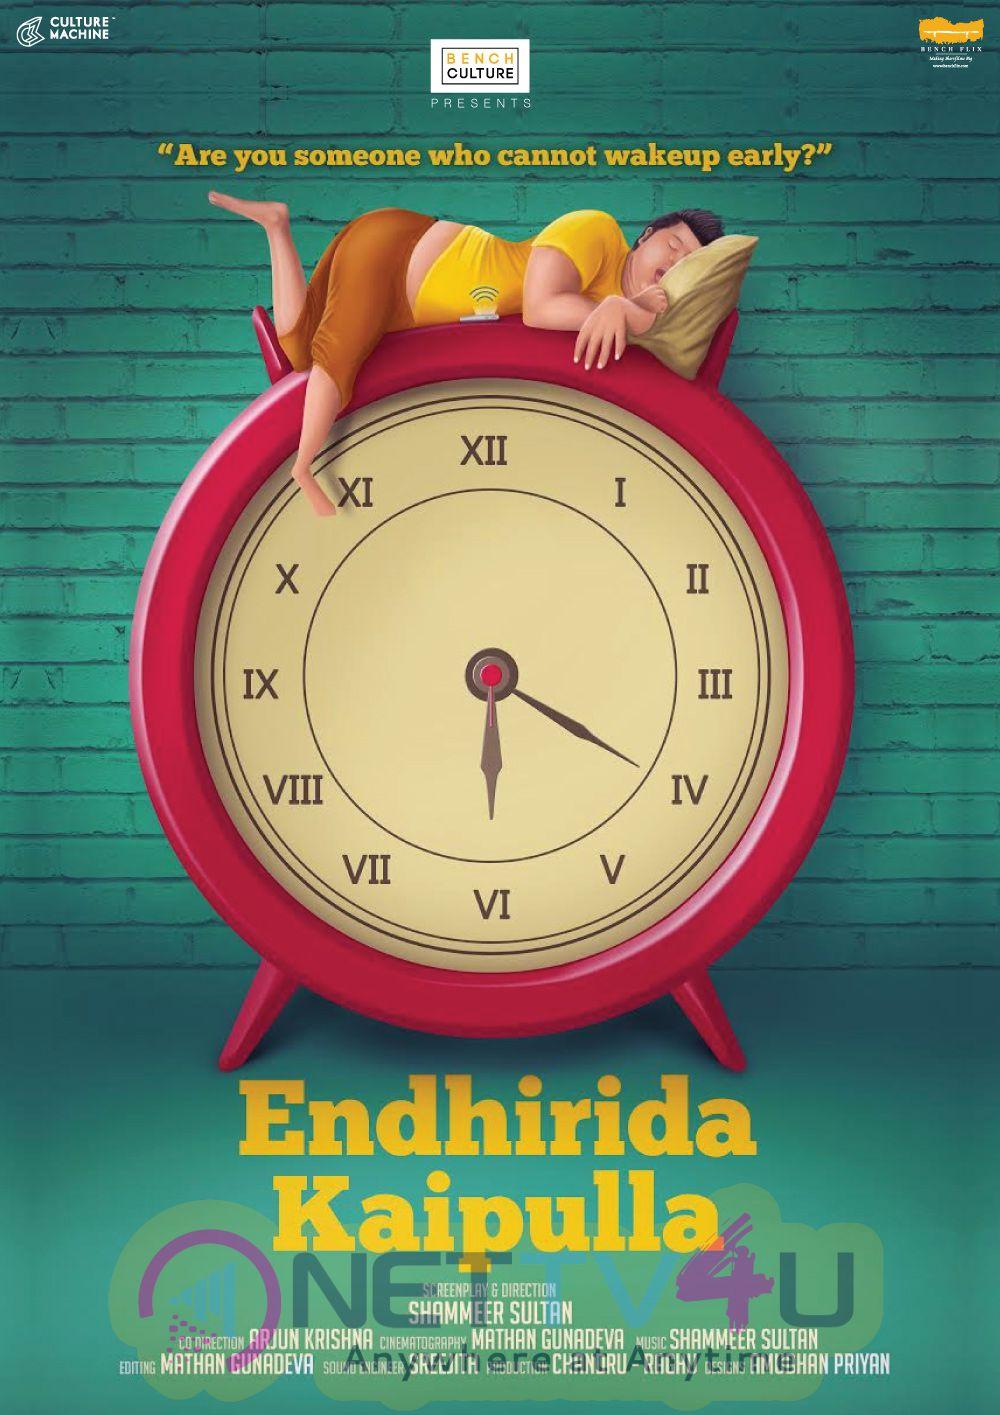 Tamil Movie Endira Kaipulla By Bench Culture Latest Stills